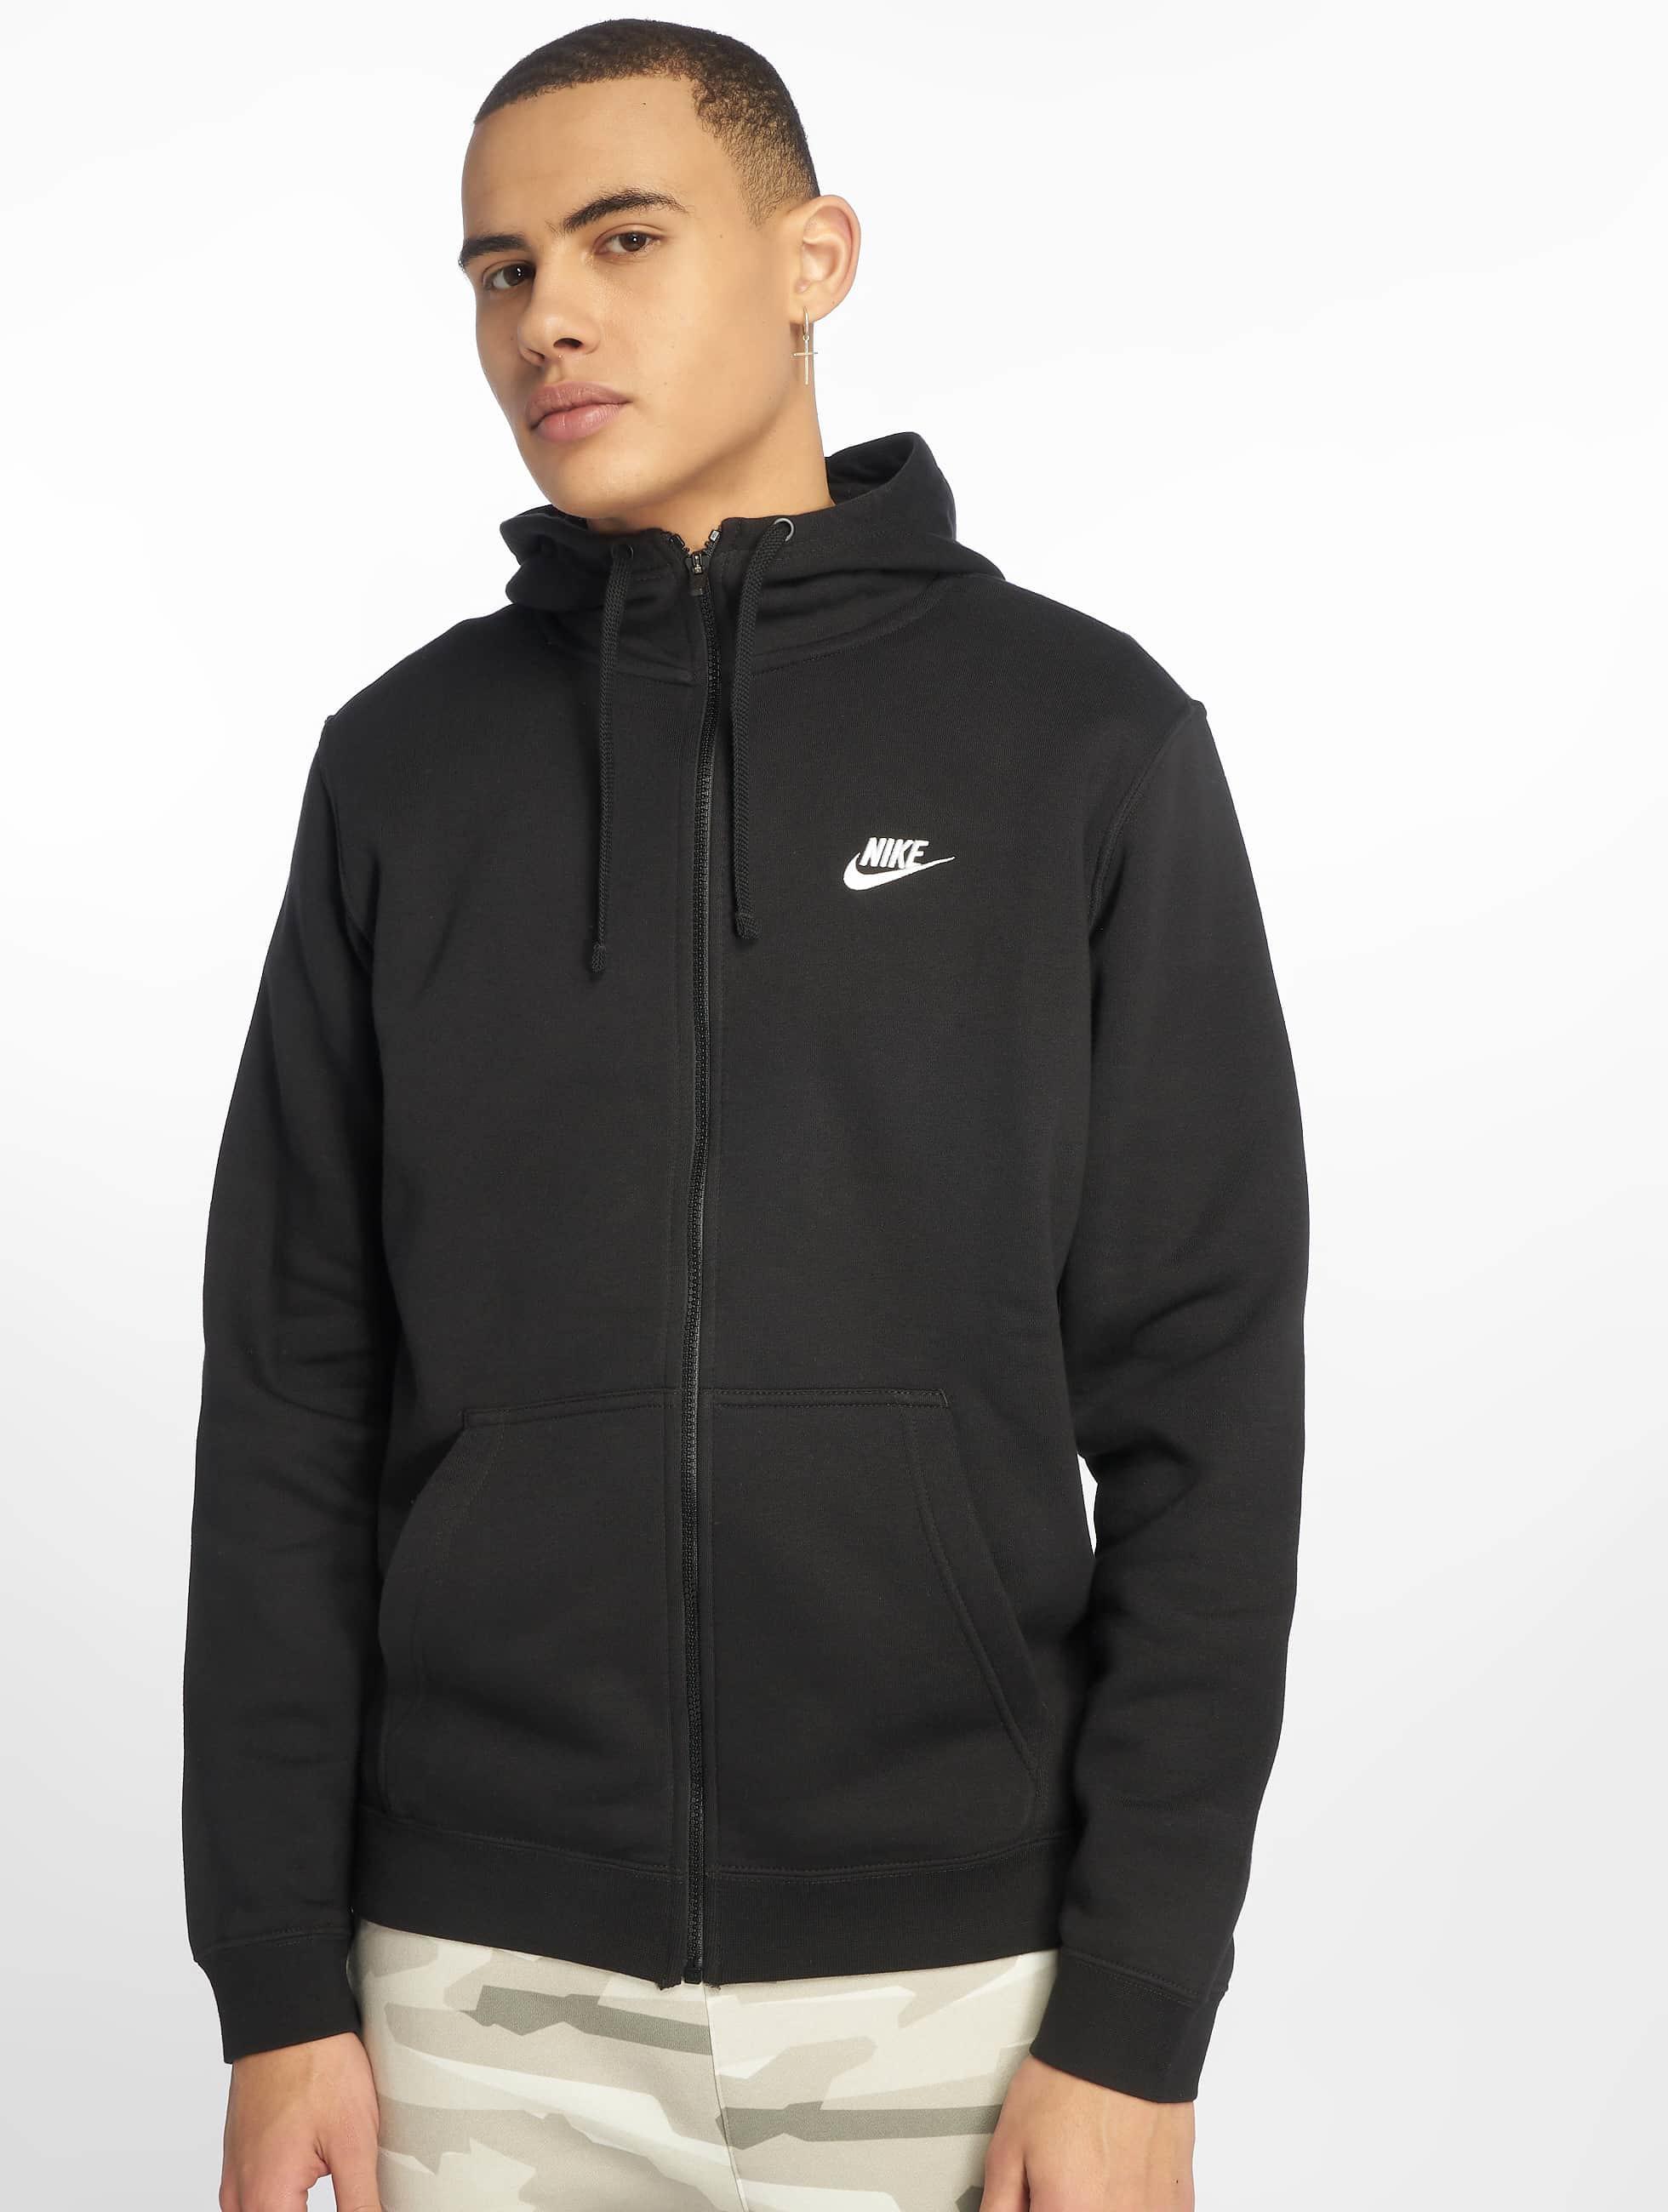 nike herren zip hoodie sportswear in schwarz 295744. Black Bedroom Furniture Sets. Home Design Ideas